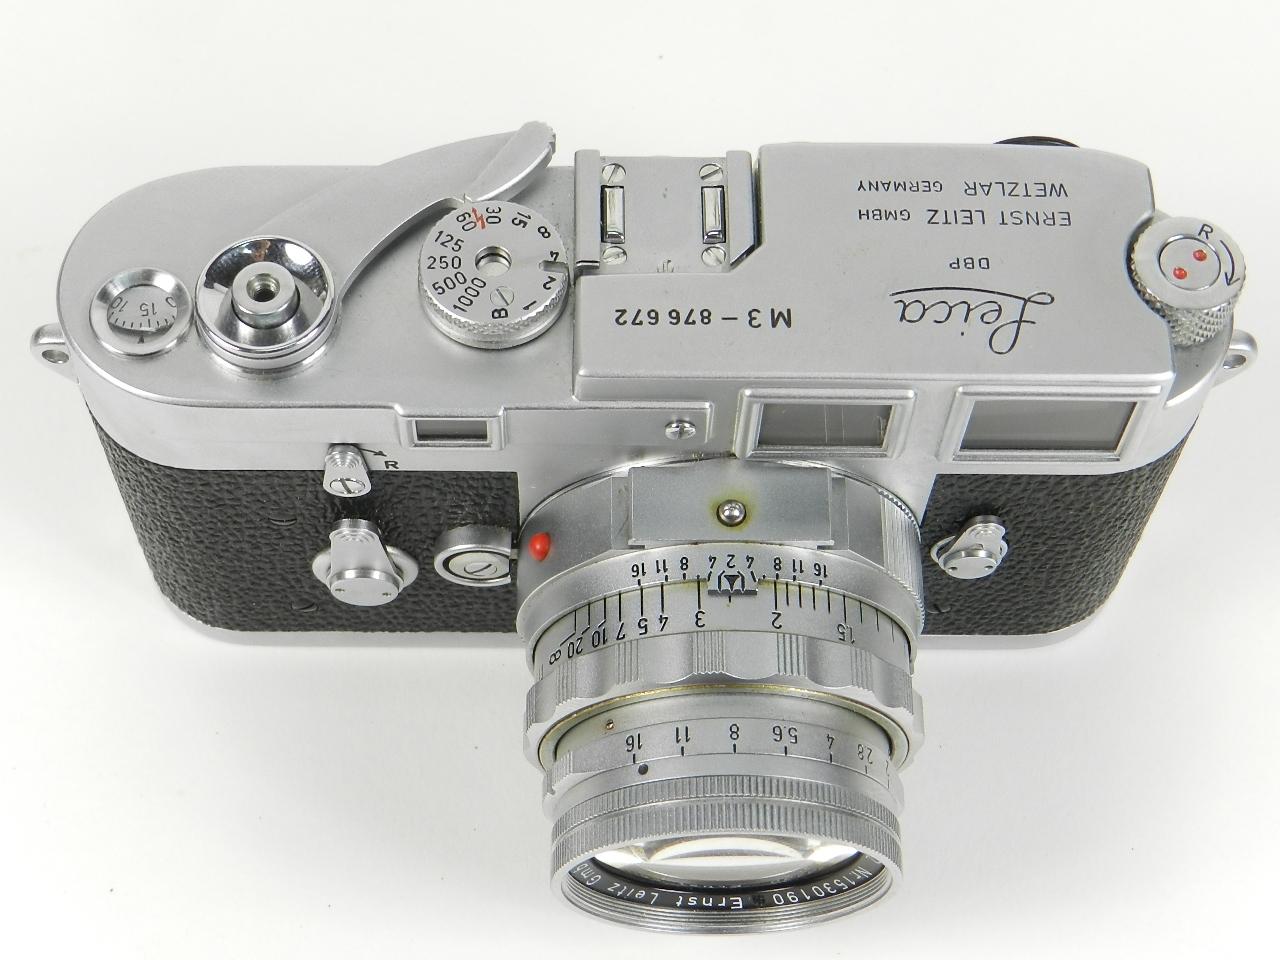 Imagen LEICA M3 AÑO 1957 + 4 OBJETIVOS + EXTRAS 28533